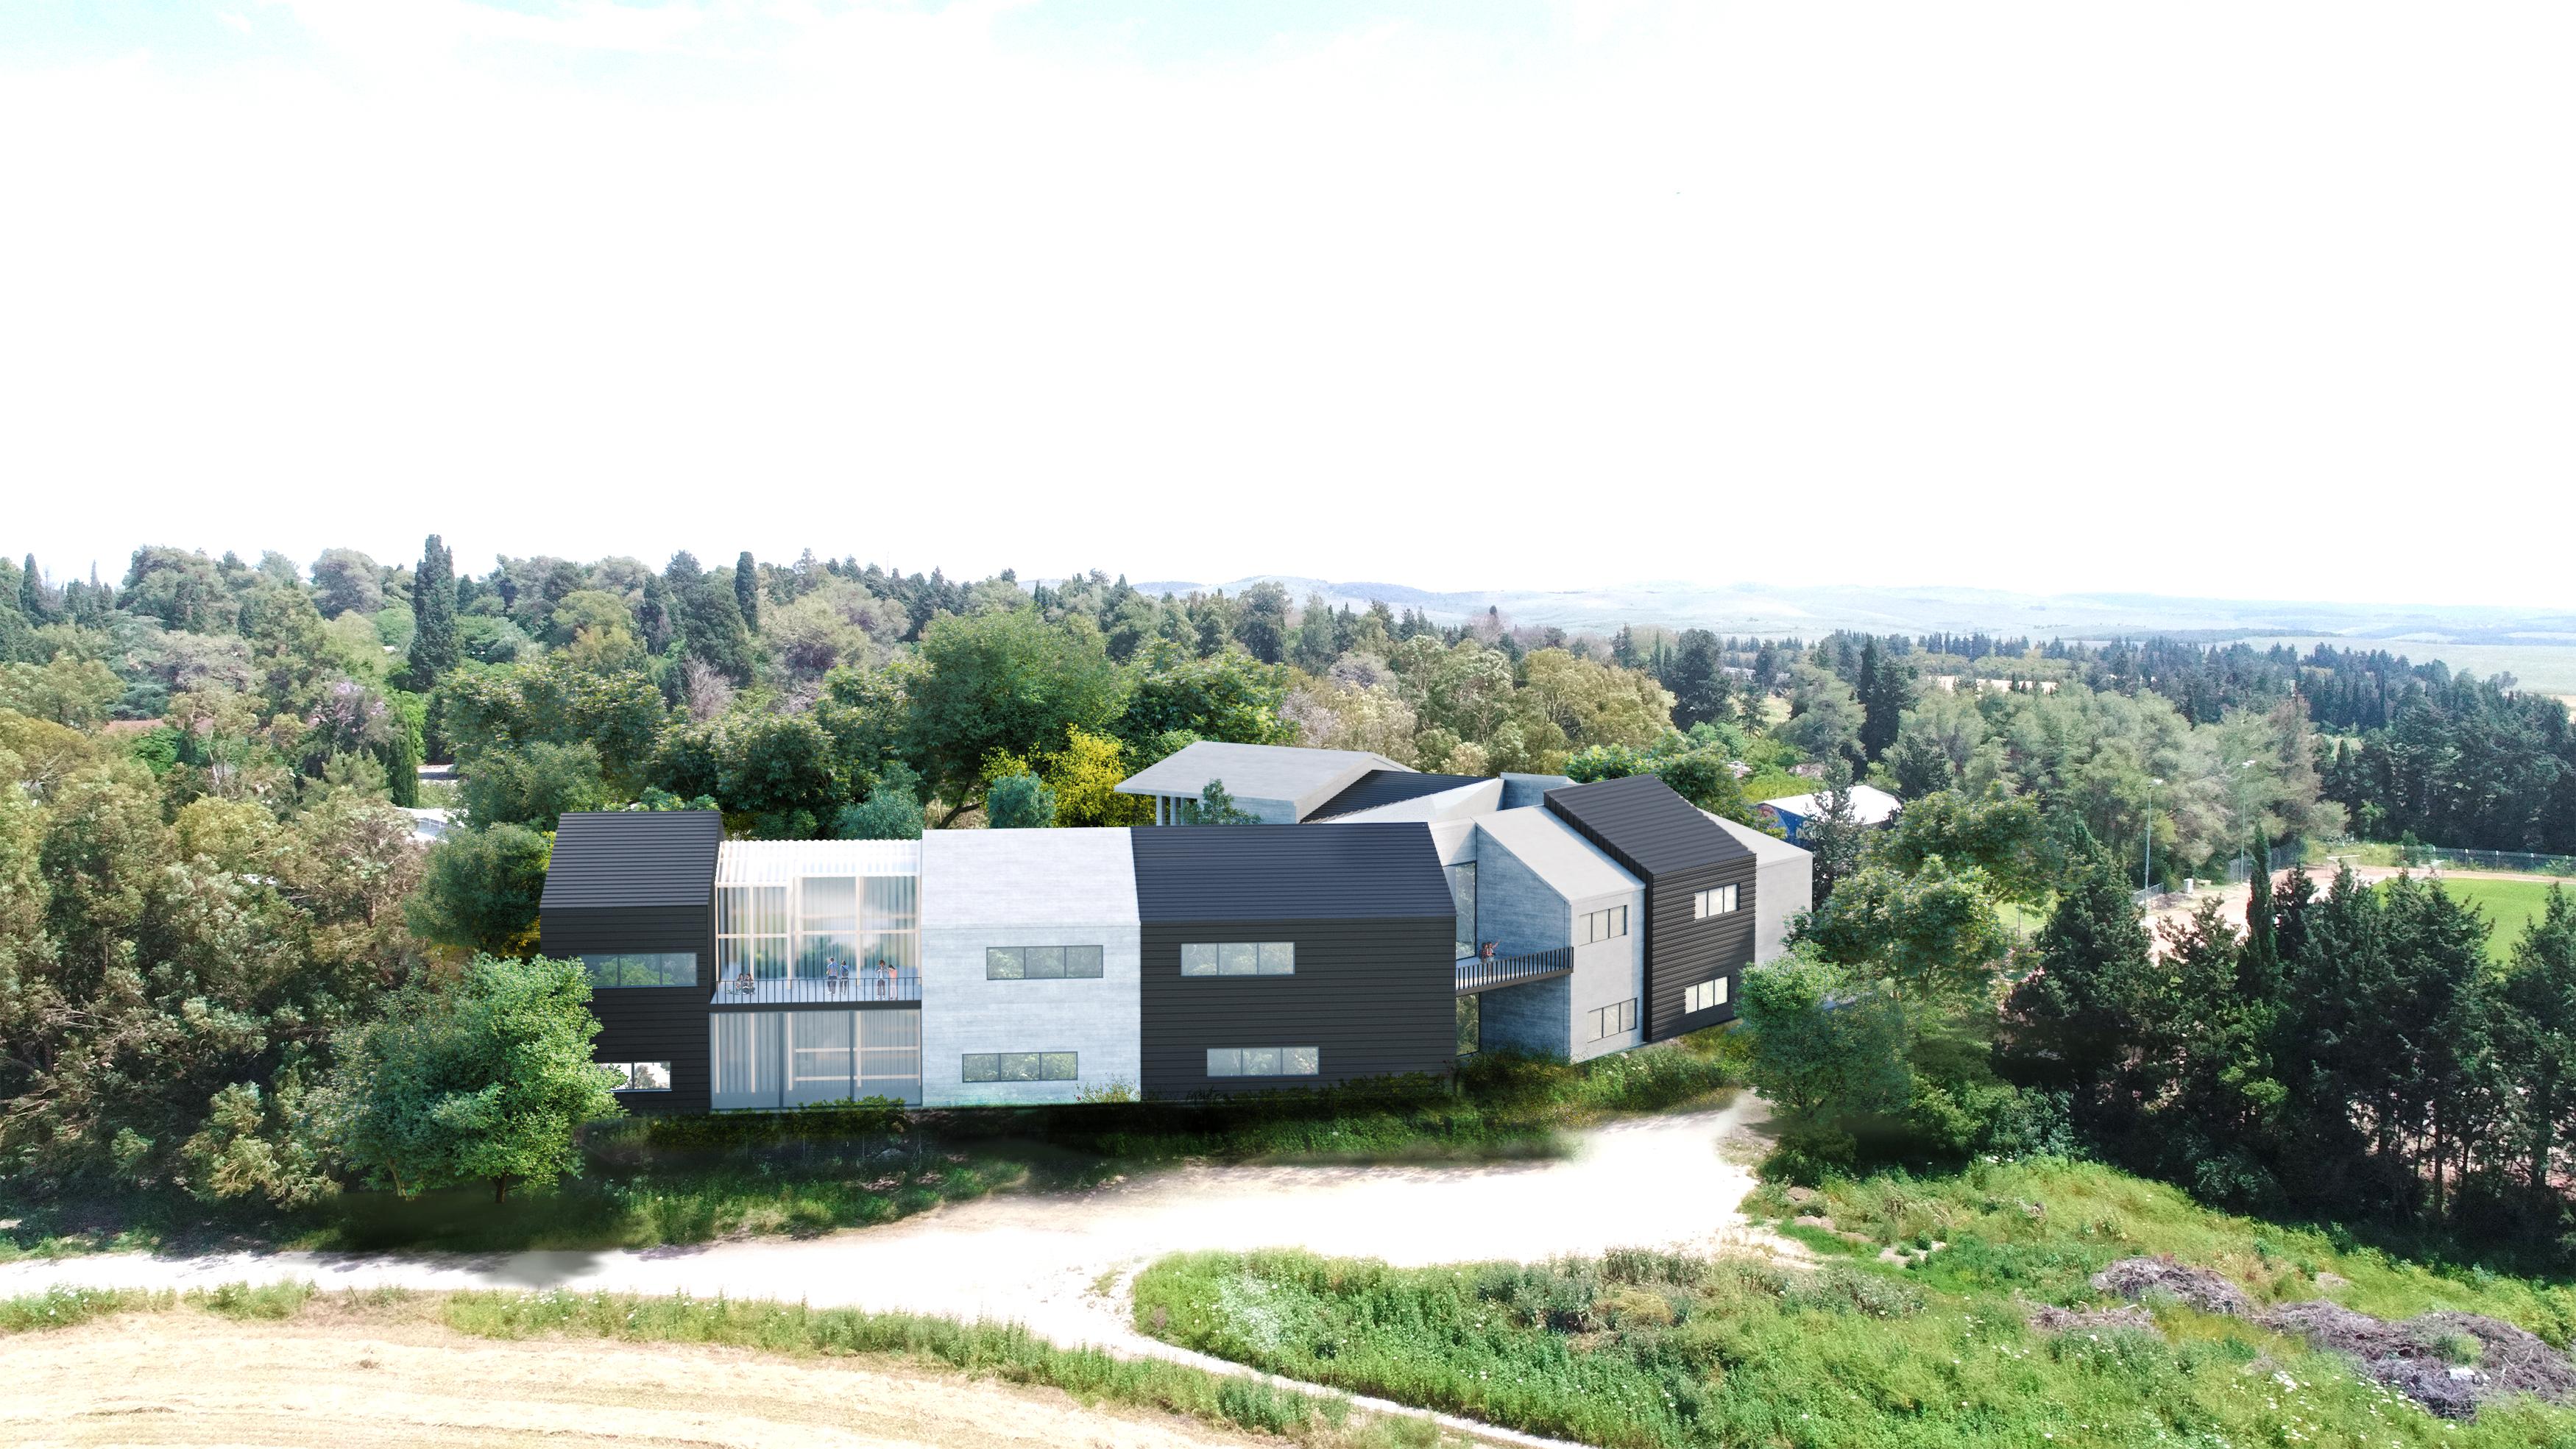 Megiddo High School